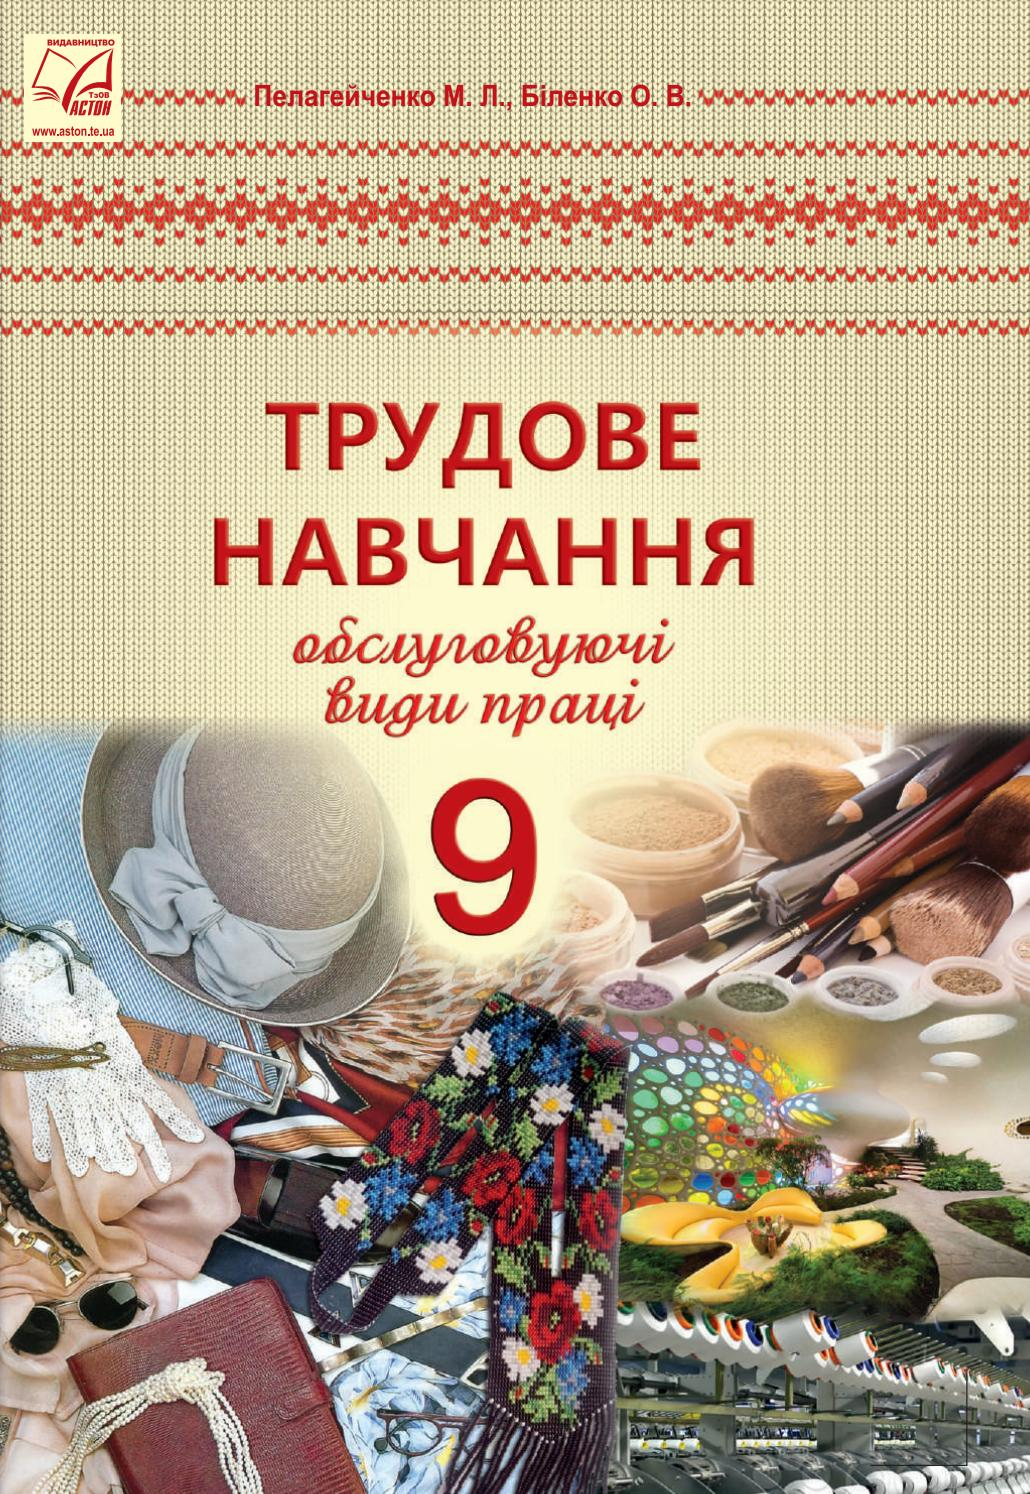 ukread net 9 klas trudove navchannja pelagejchenko 2017 by UkRead.Net -  issuu 43f3085cc9749